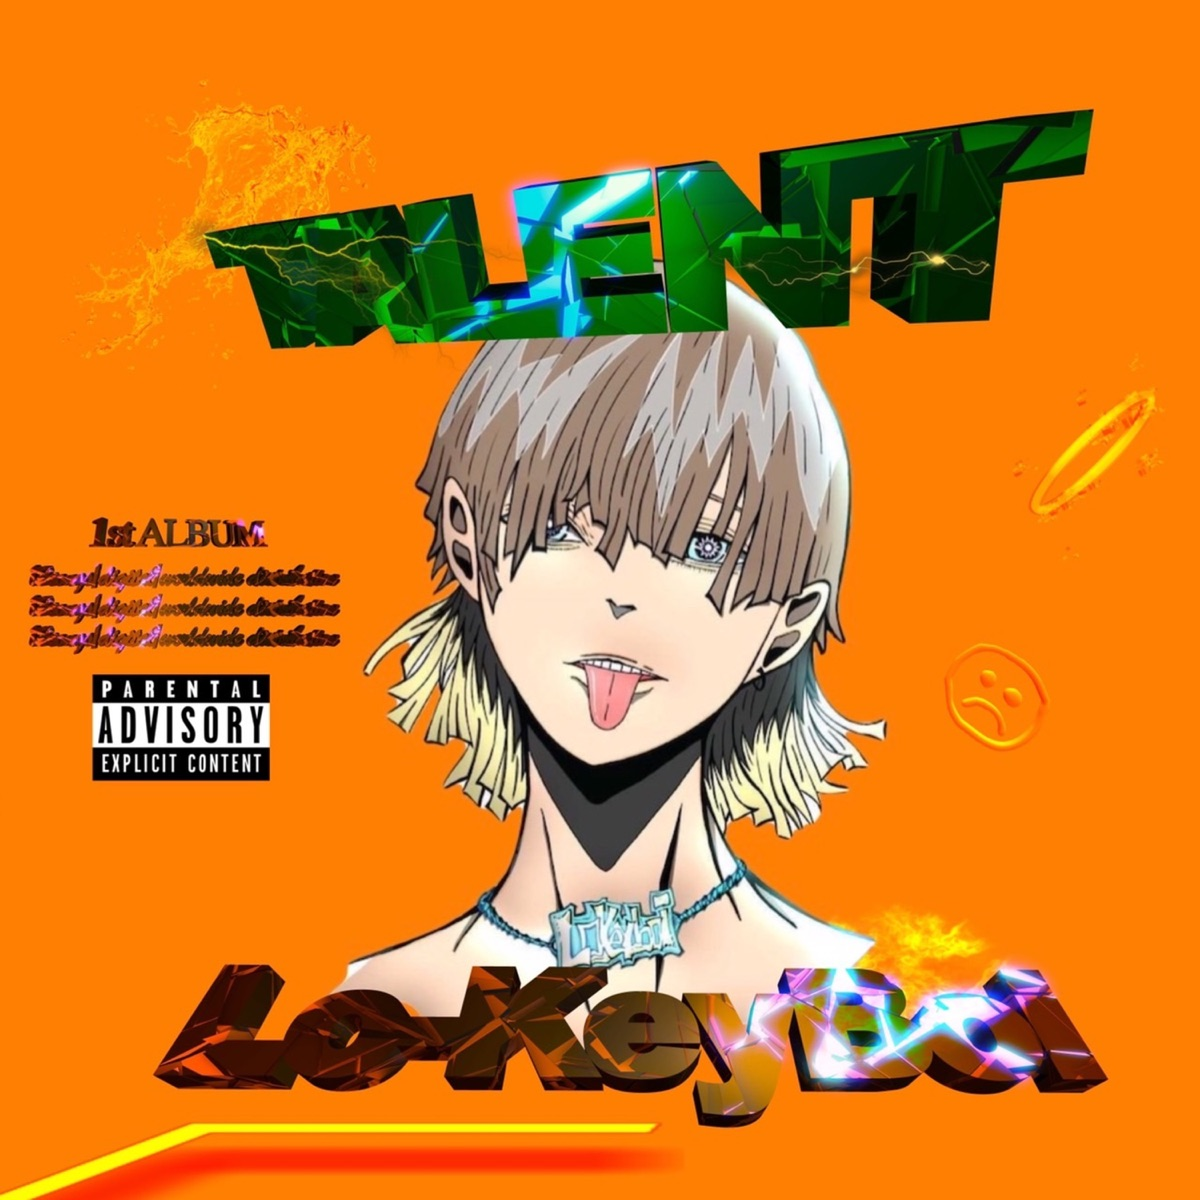 『Lo-keyBoi - 名神Drive』収録の『TALENT』ジャケット